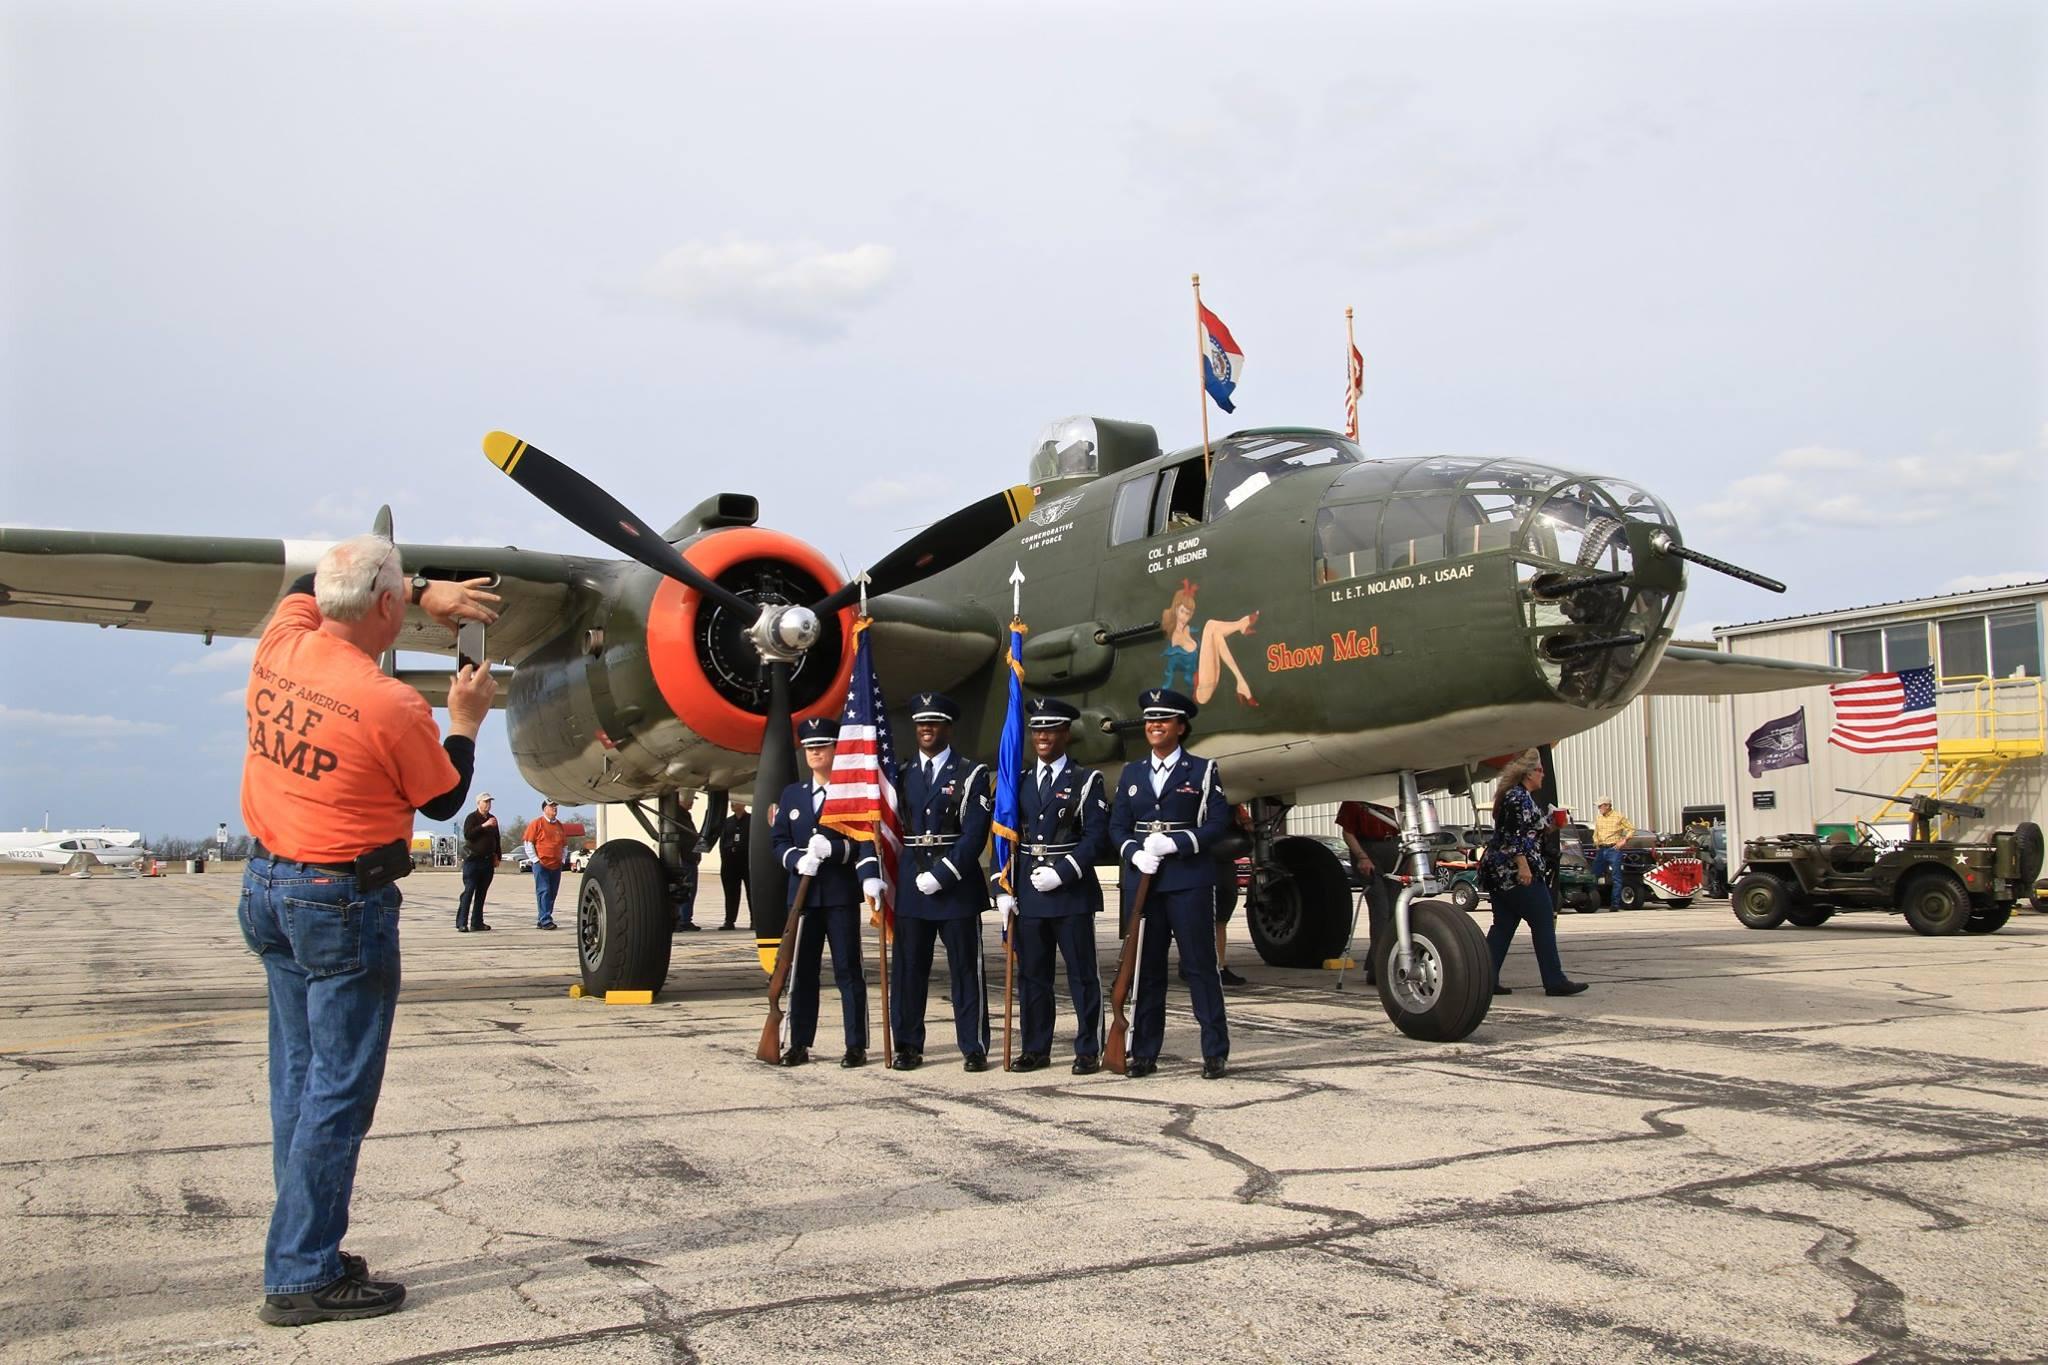 B-25 Show Me